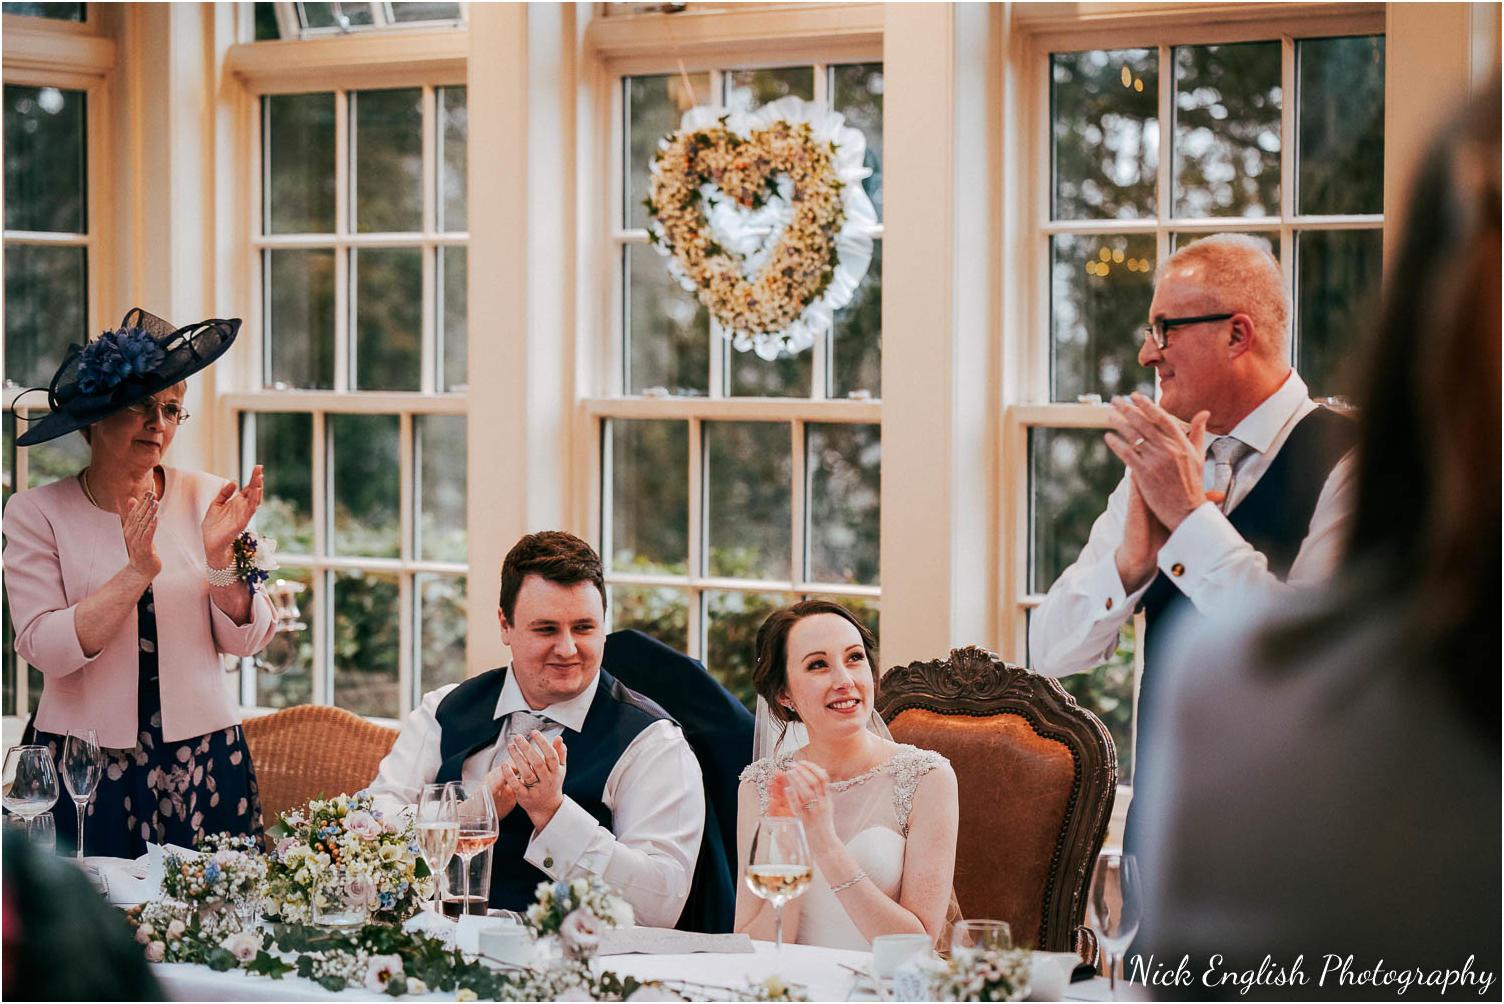 Mitton_Hall_Wedding_Photographer-96.jpg